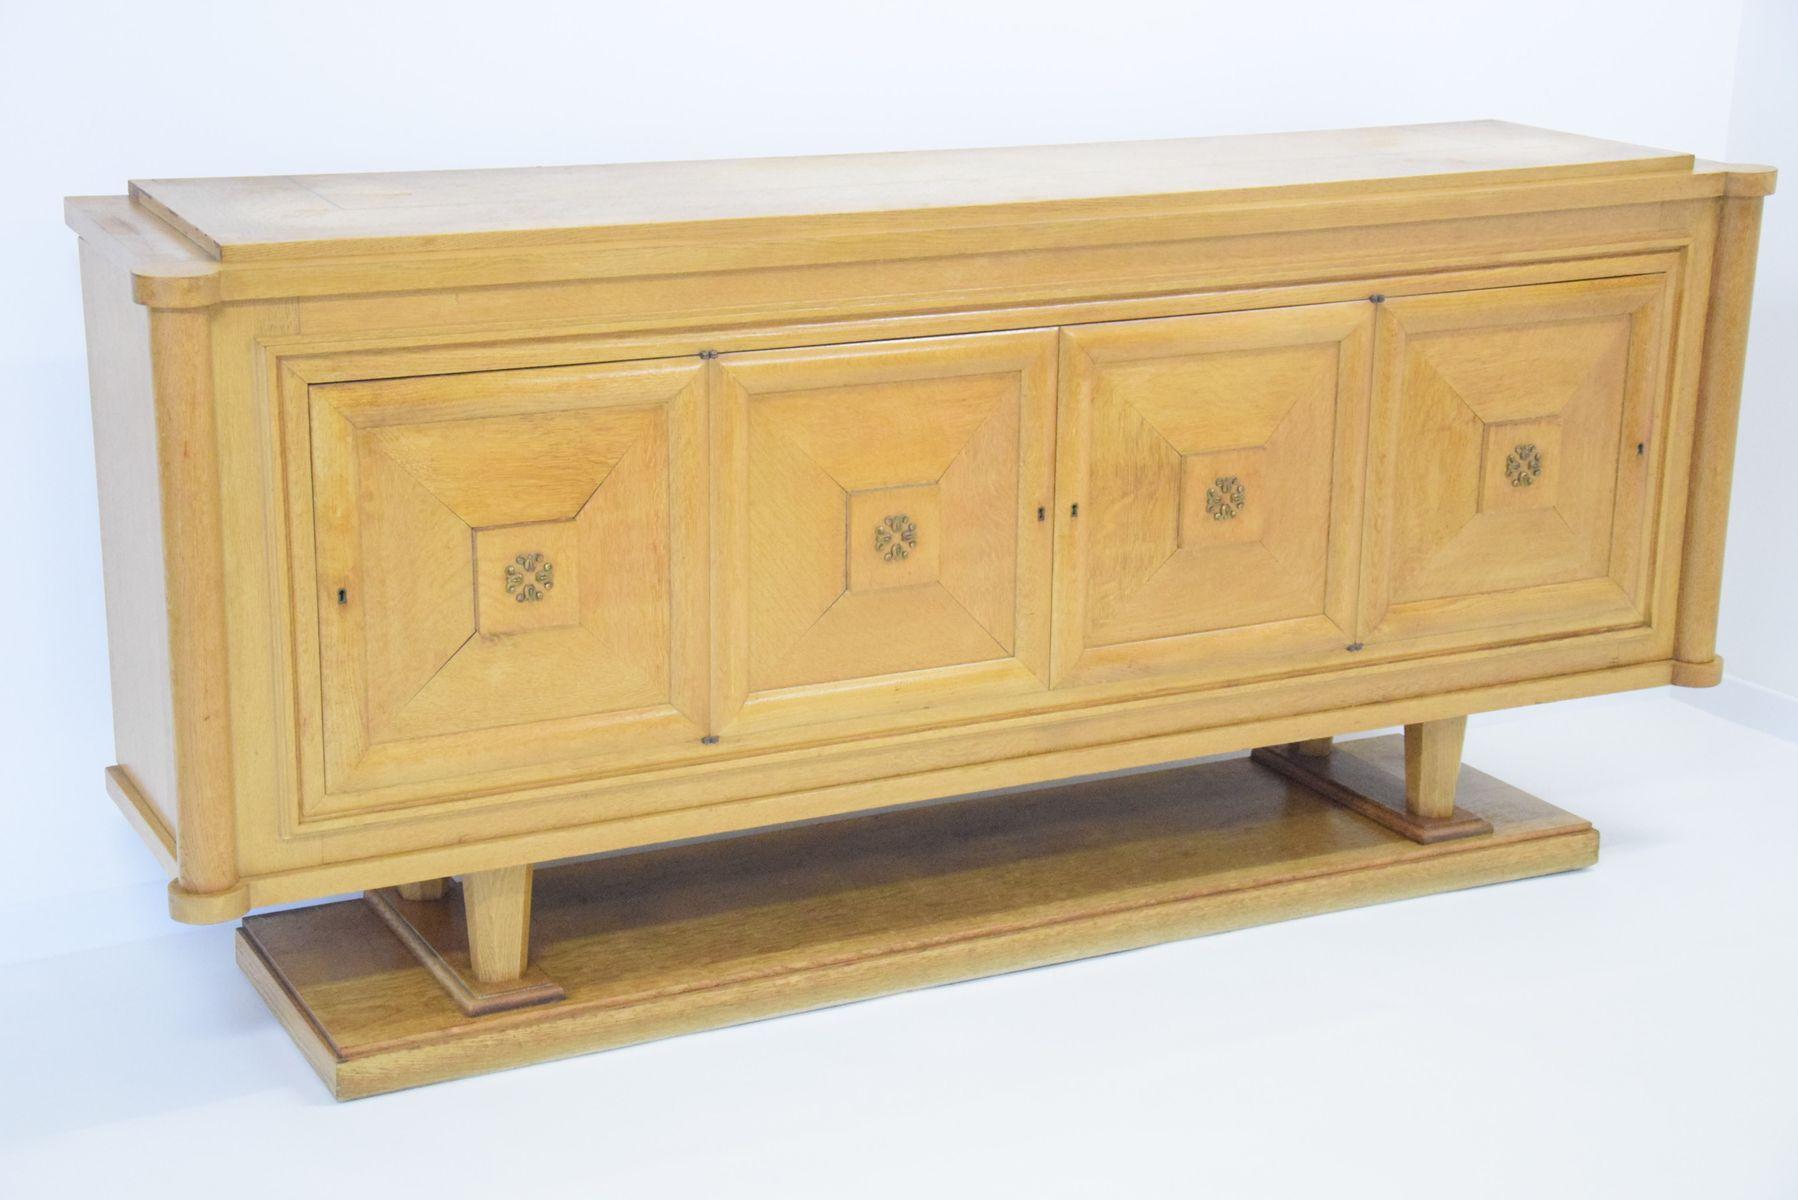 Credenza Danese Vintage : Credenza vintage anni best in legno